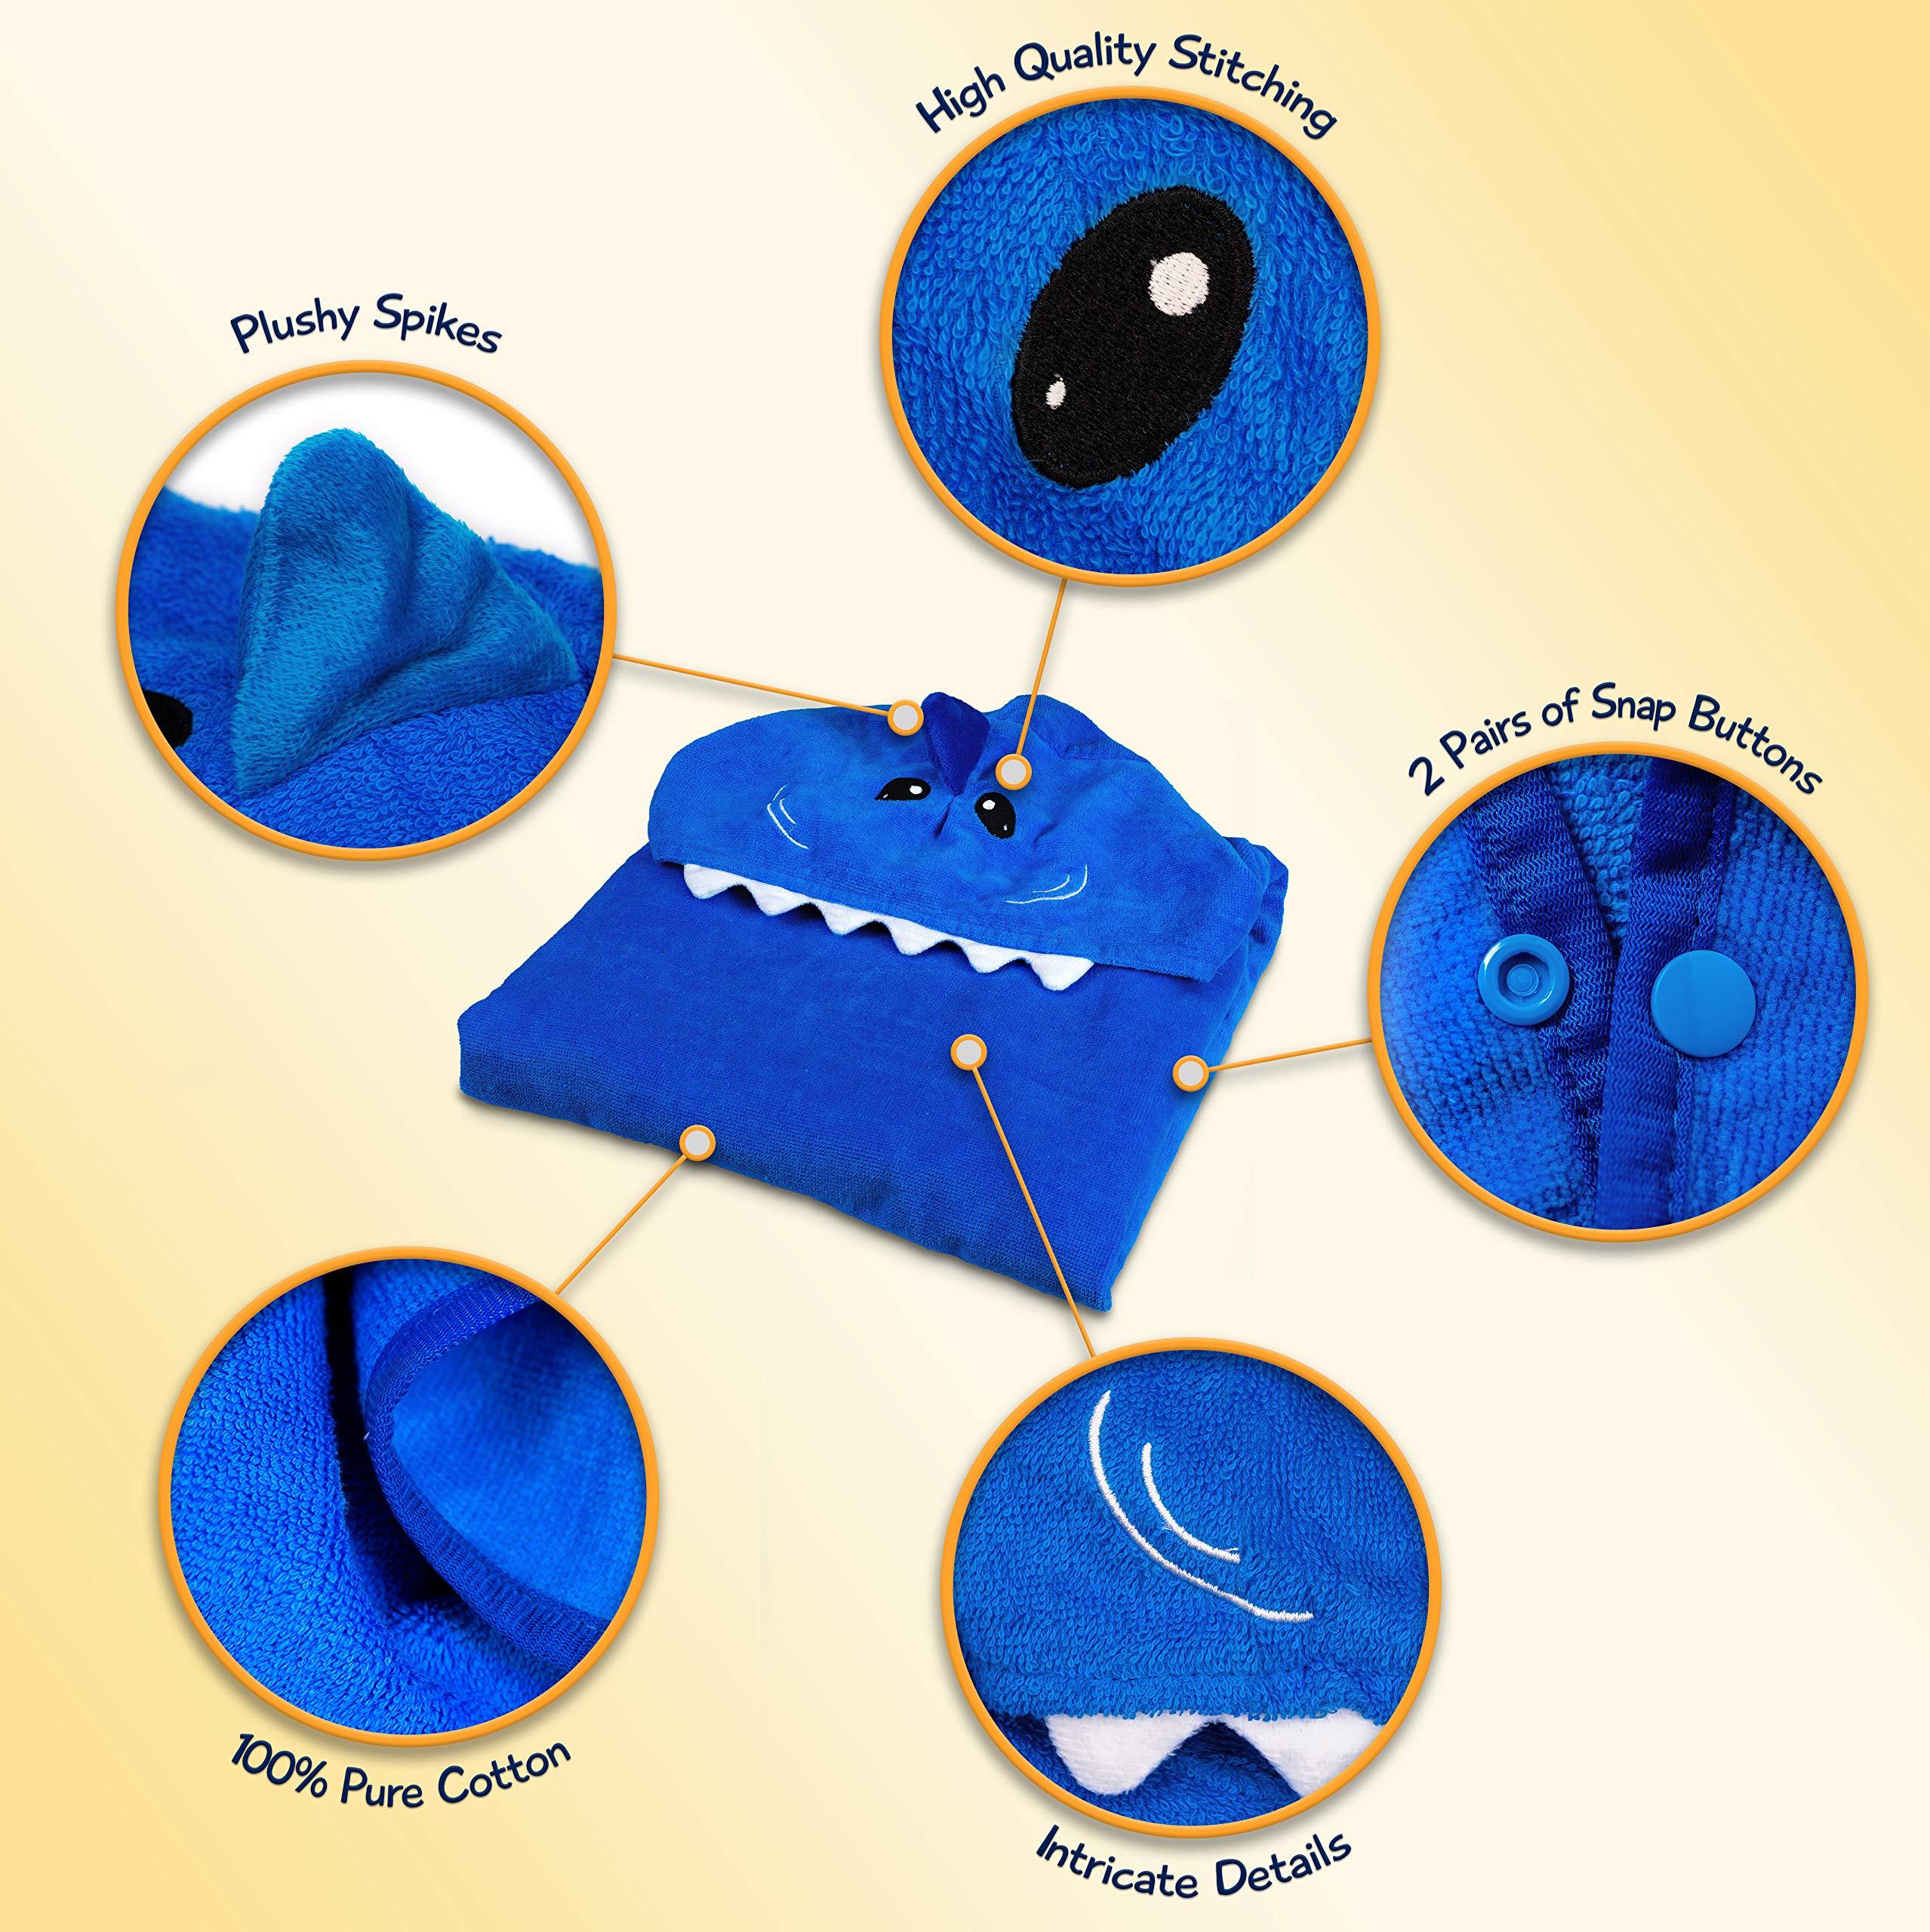 Hudz Kidz Hooded Towel for Kids & Toddlers, Ideal at Bath, Beach, Pool by Hudz Kidz (Image #3)